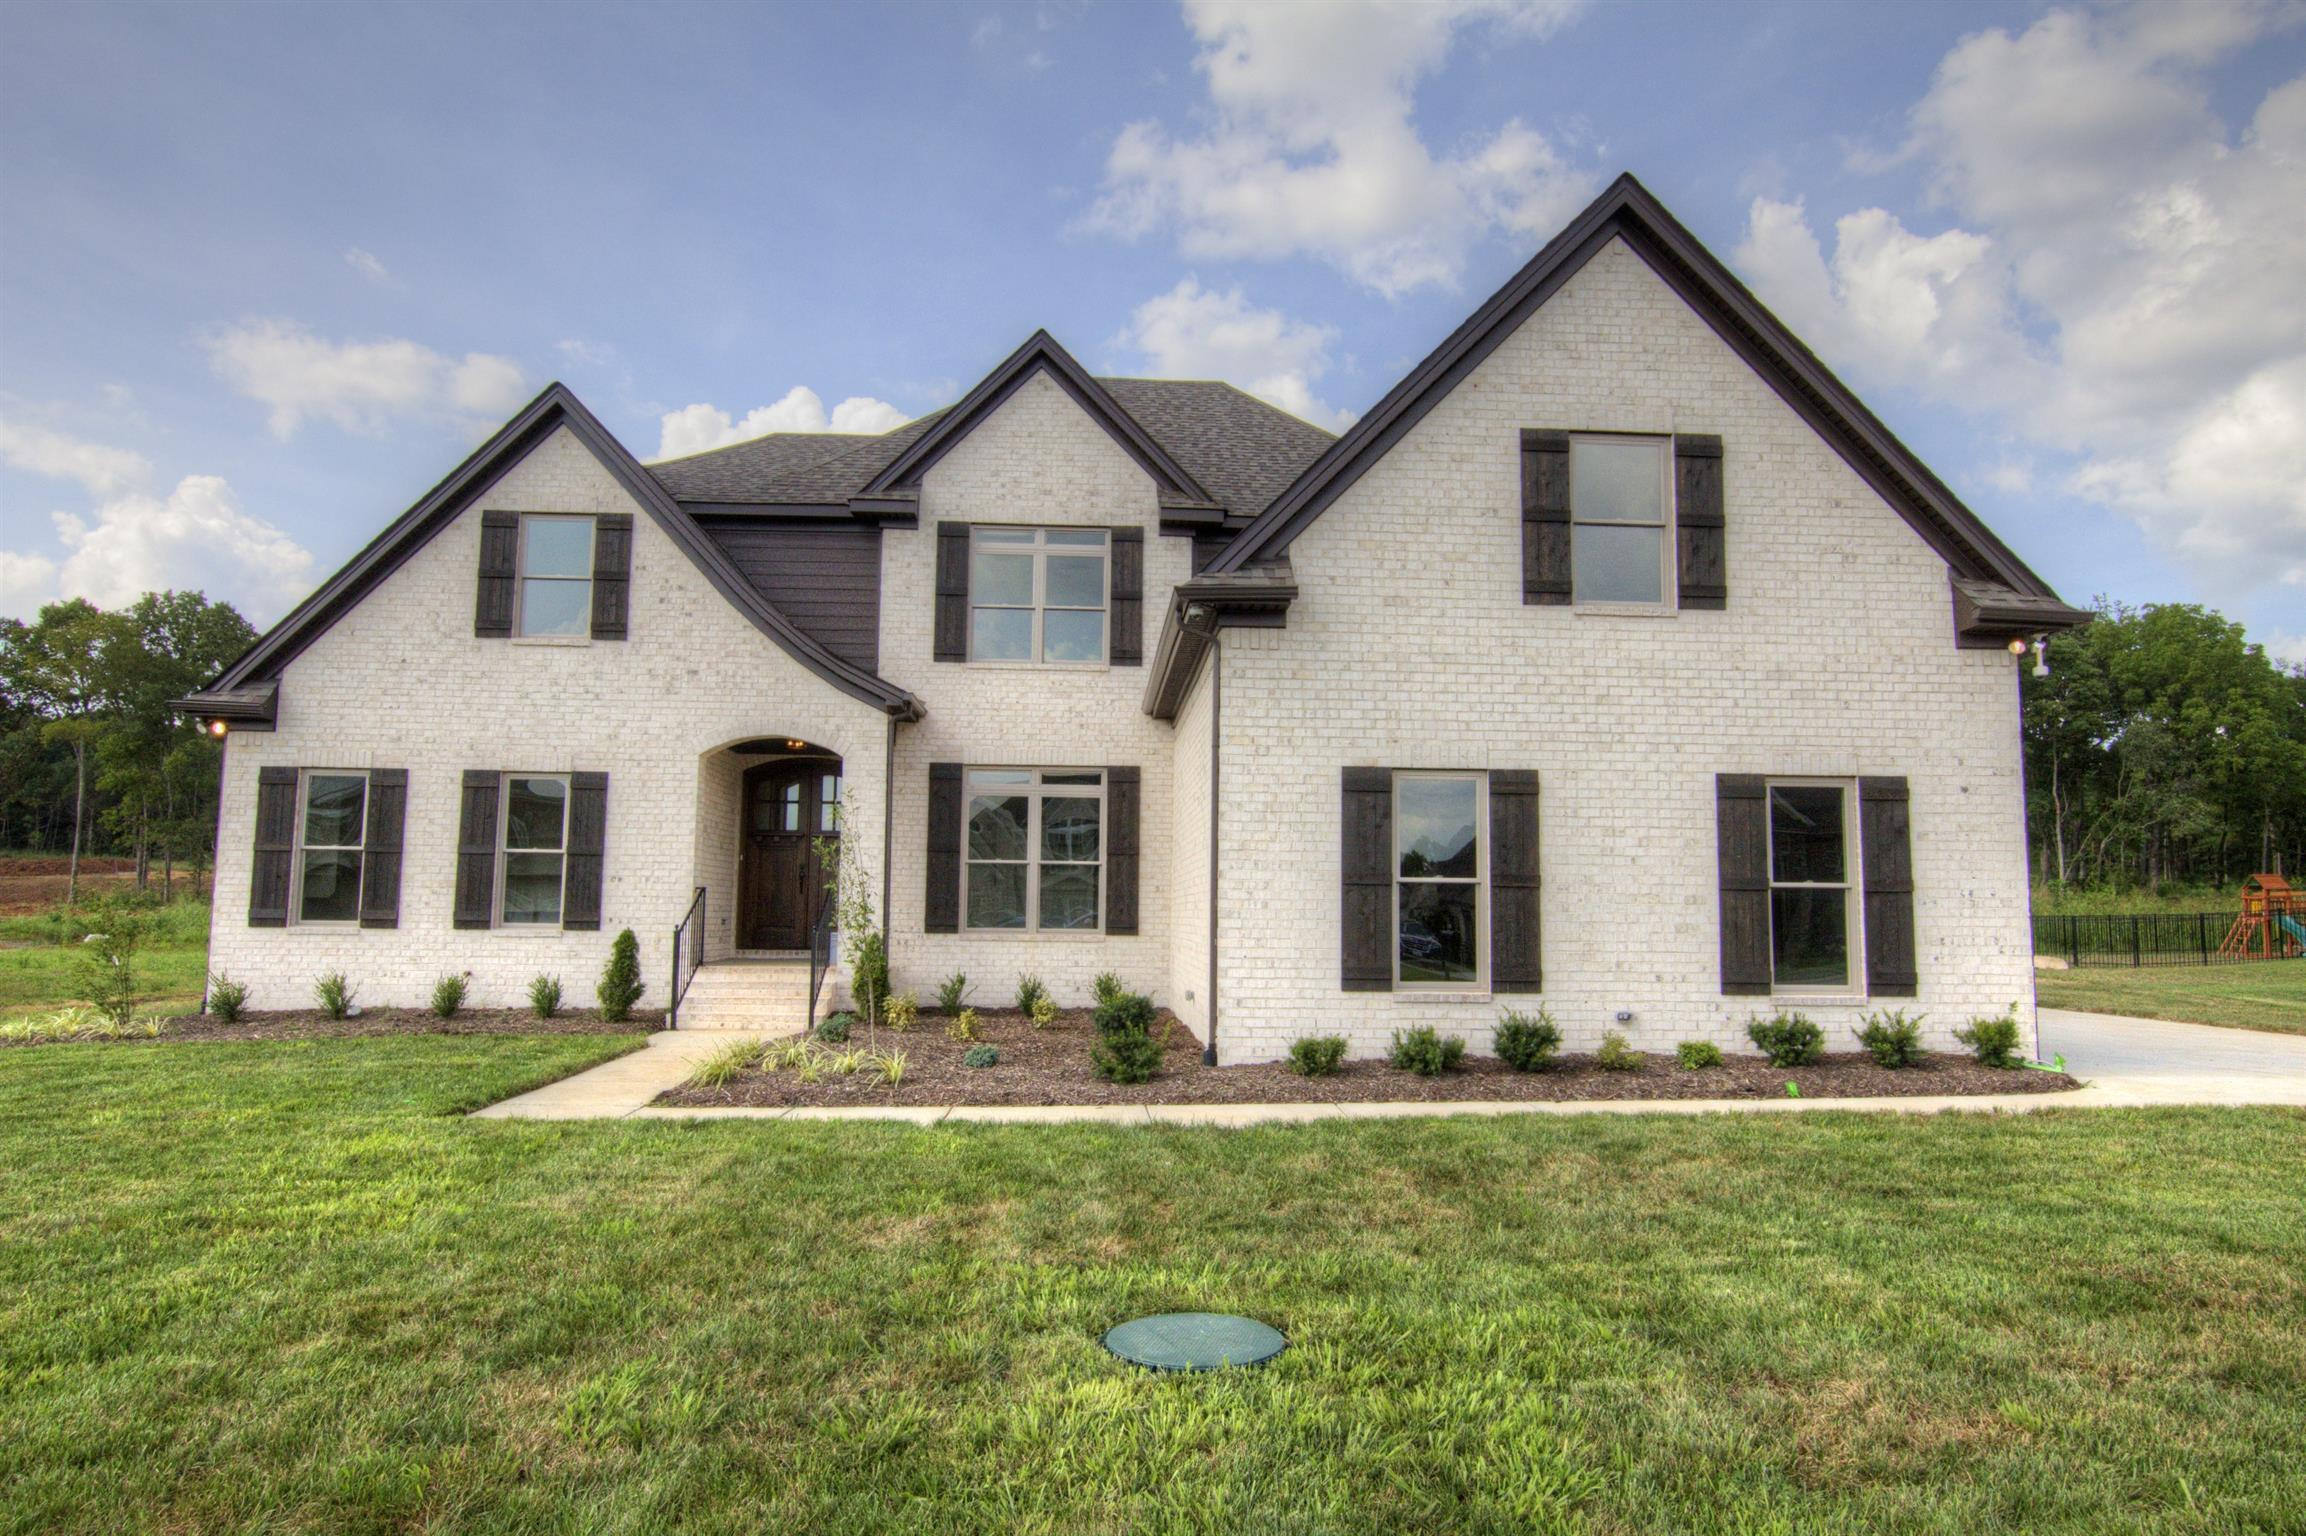 180 Knoxleigh Way- #109, Murfreesboro, TN 37129 - Murfreesboro, TN real estate listing